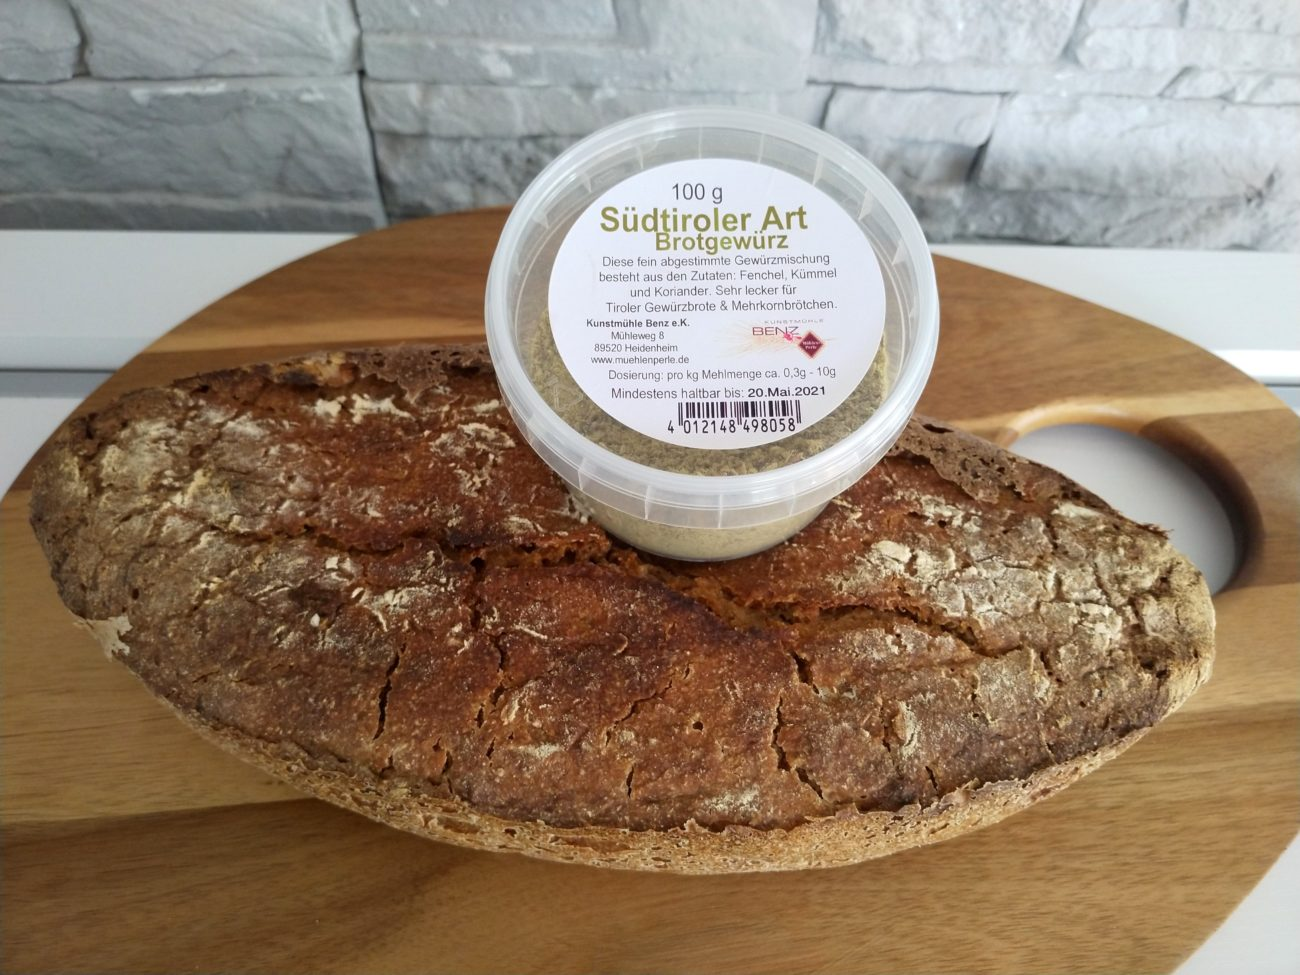 Roggenmischbrot mit Südtiroler Brotgewürz